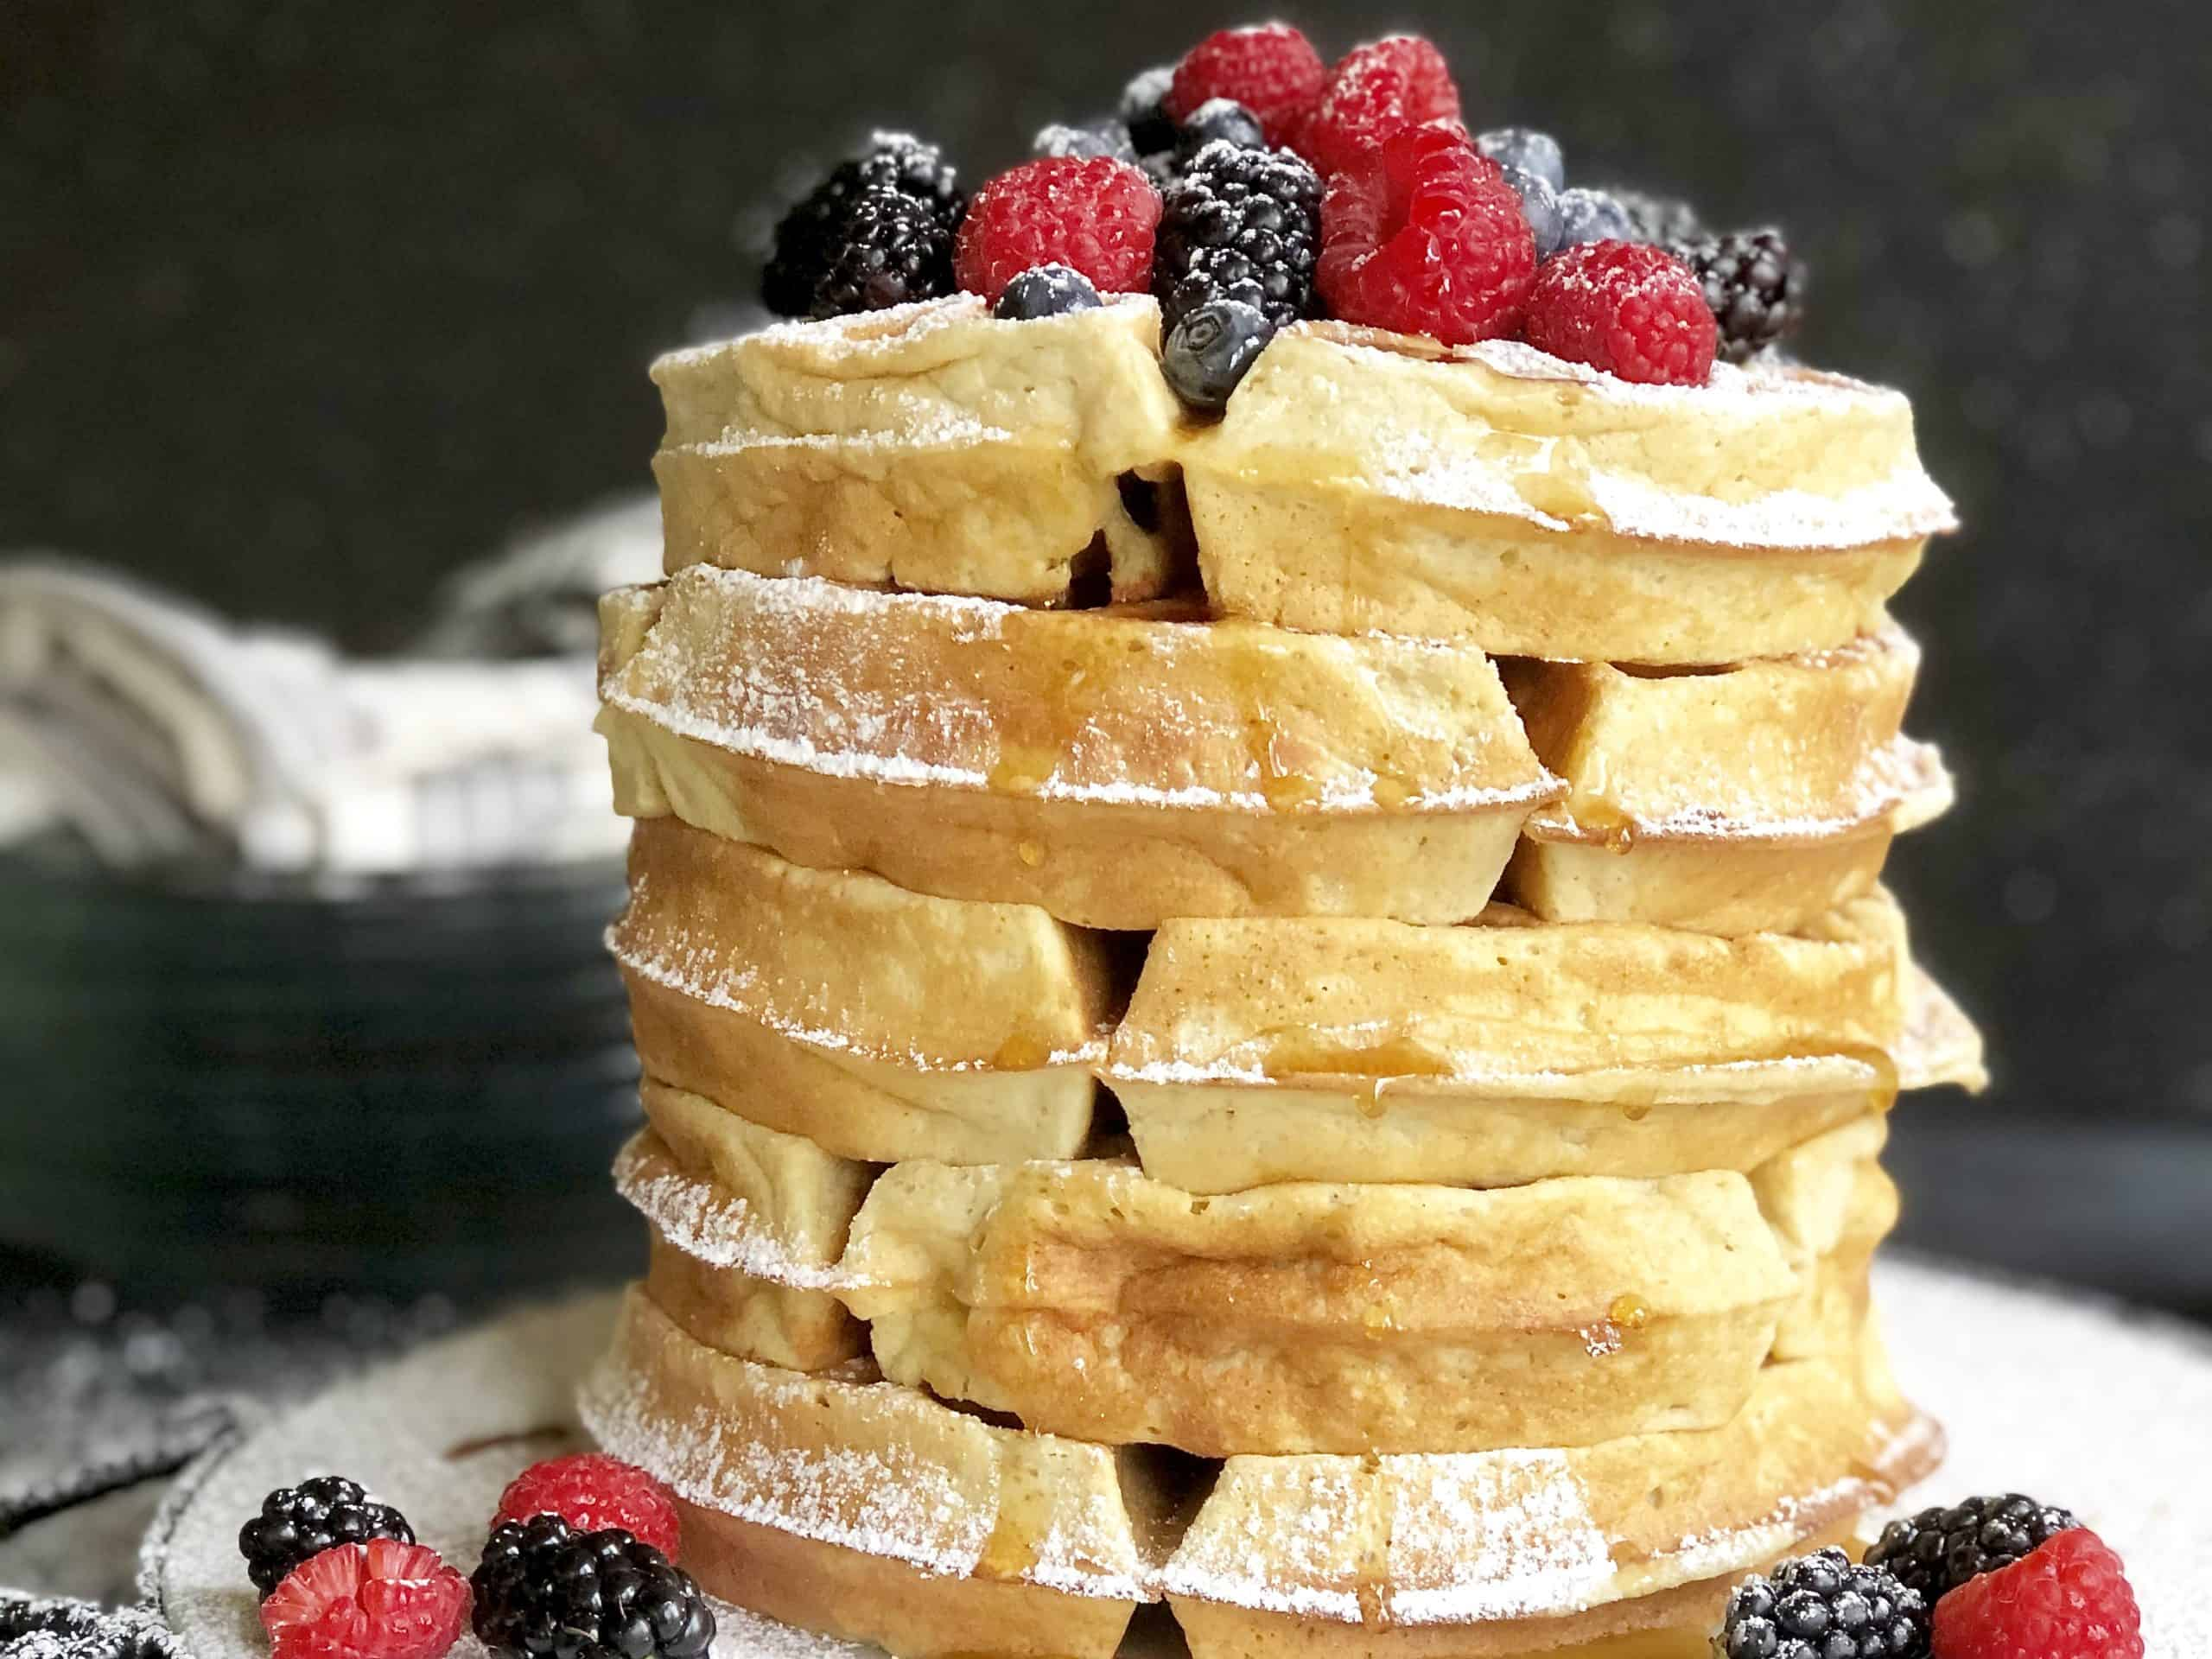 gluten-free (or not) classic belgian waffles